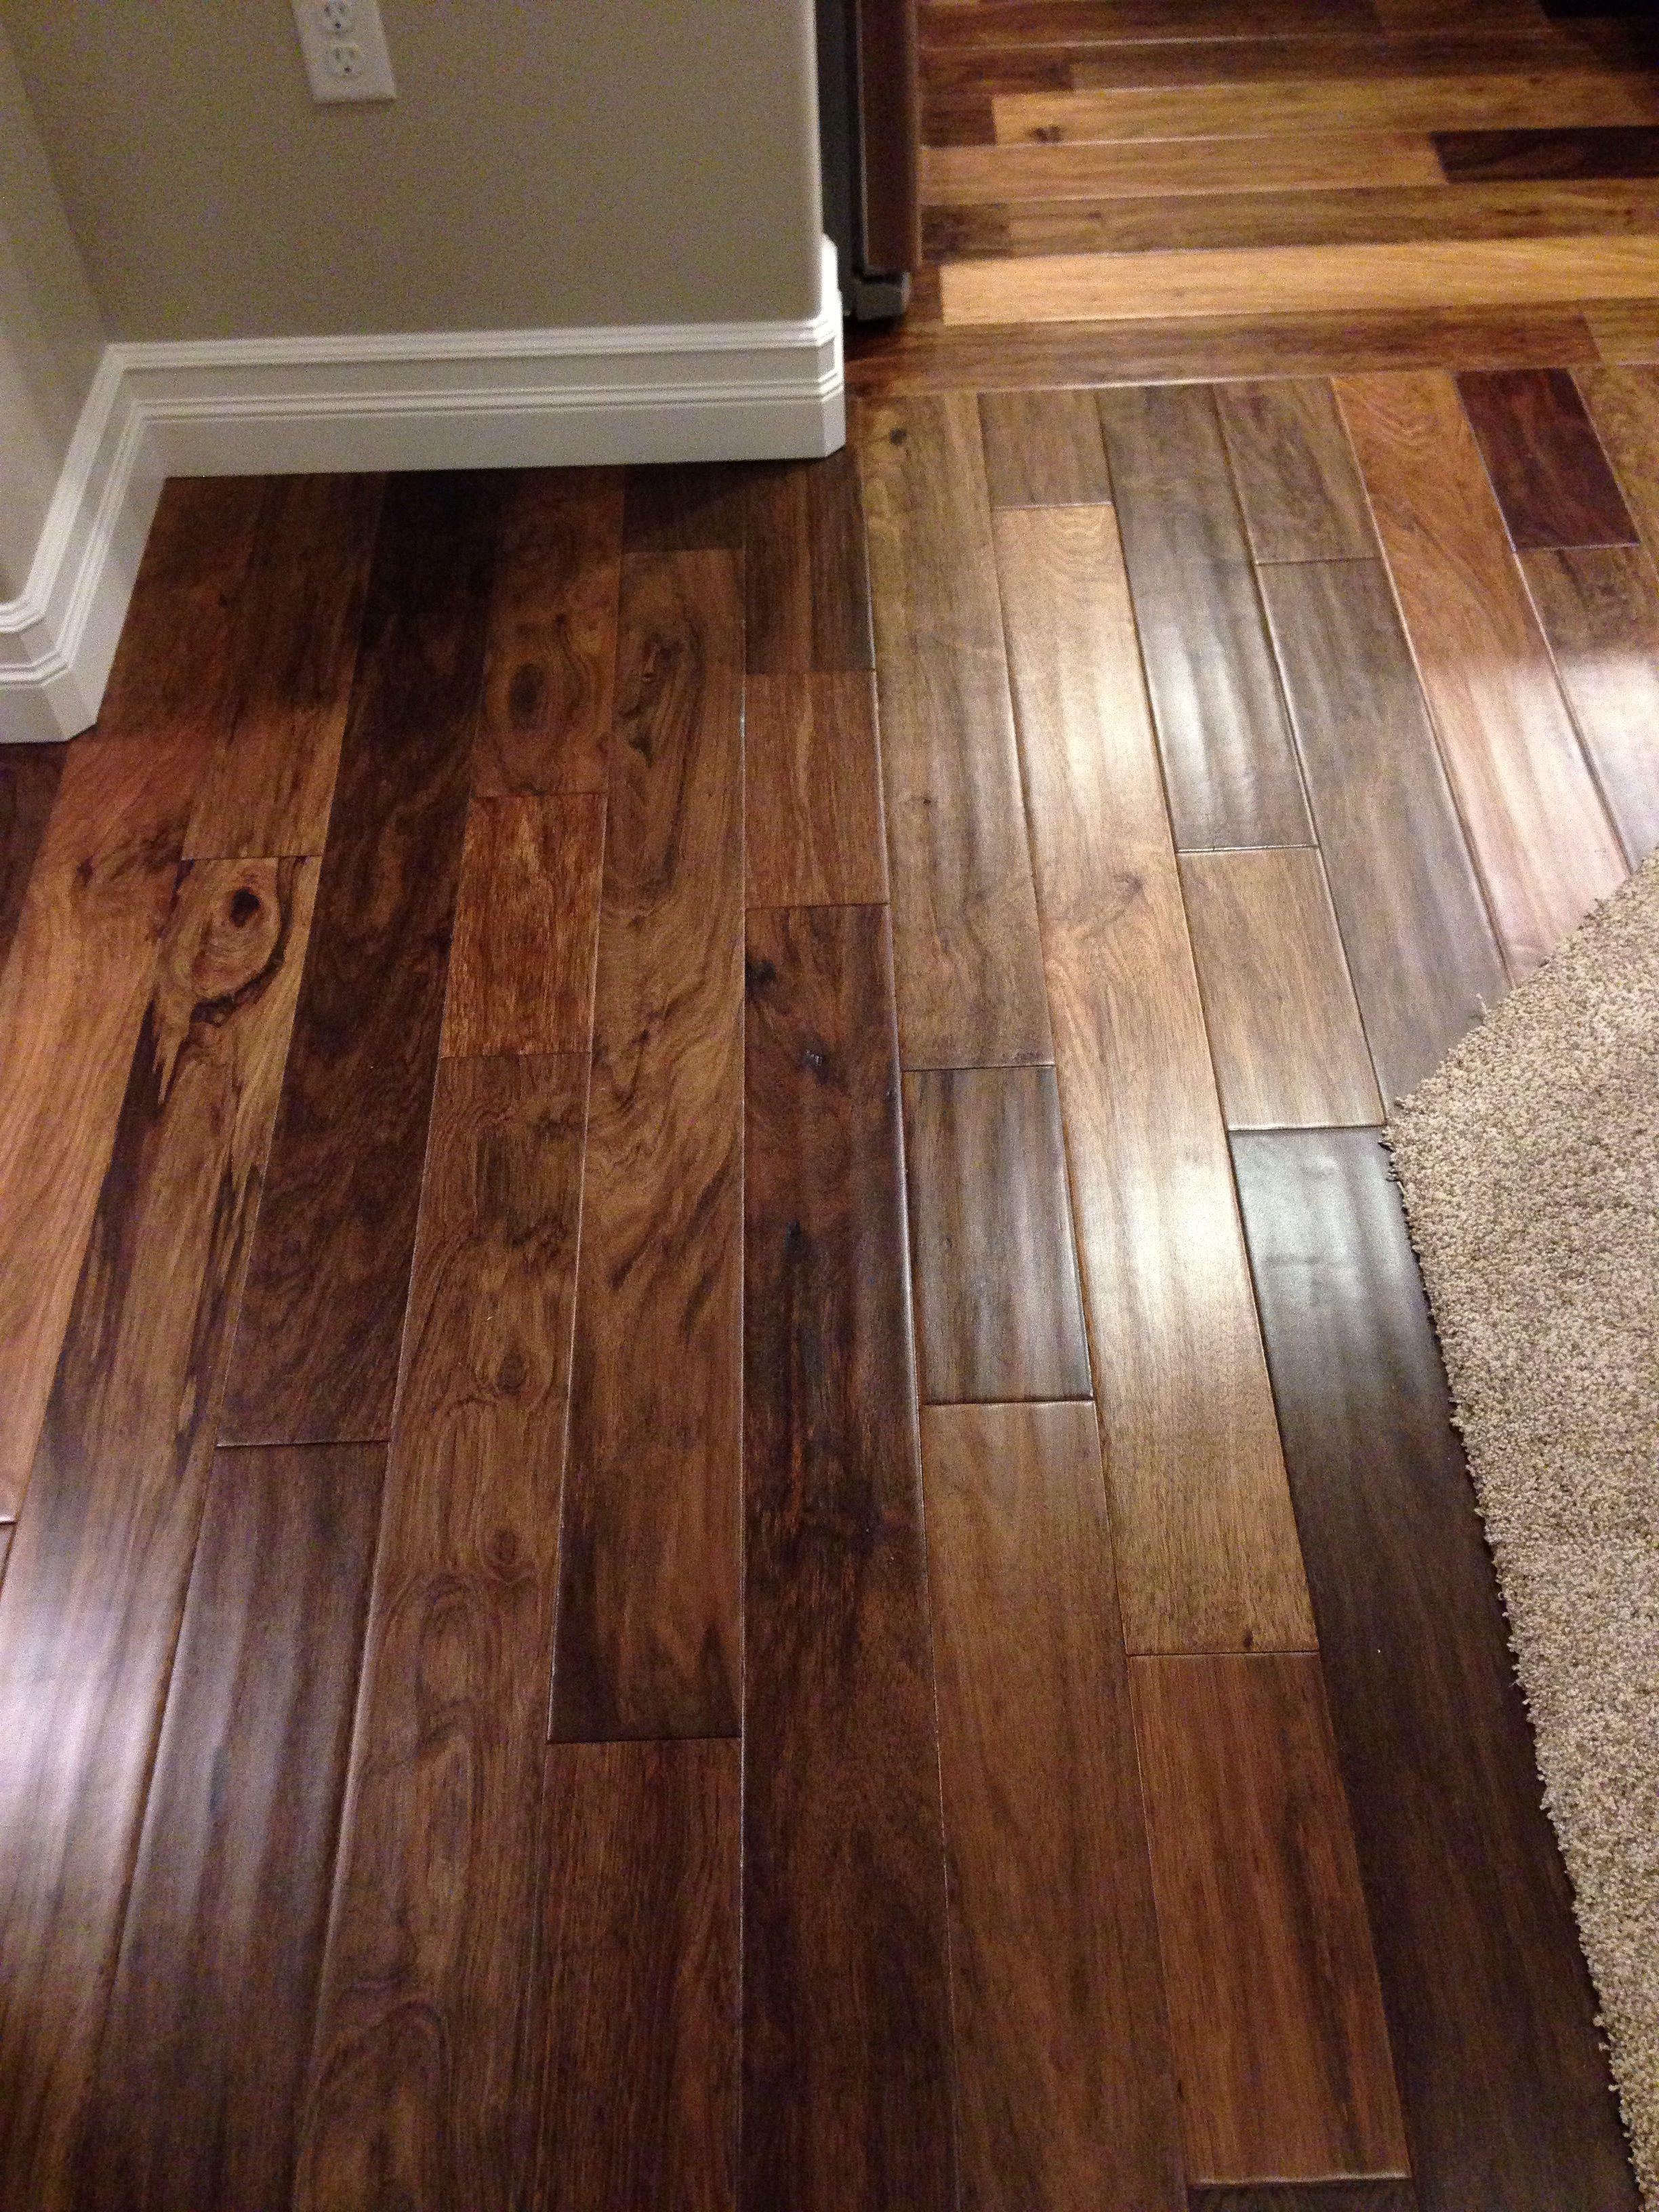 mohawk hardwood flooring installation of african ebony engineered wood floor by mohawk 5 inch plank hand regarding african ebony engineered wood floor by mohawk 5 inch plank hand scraped would